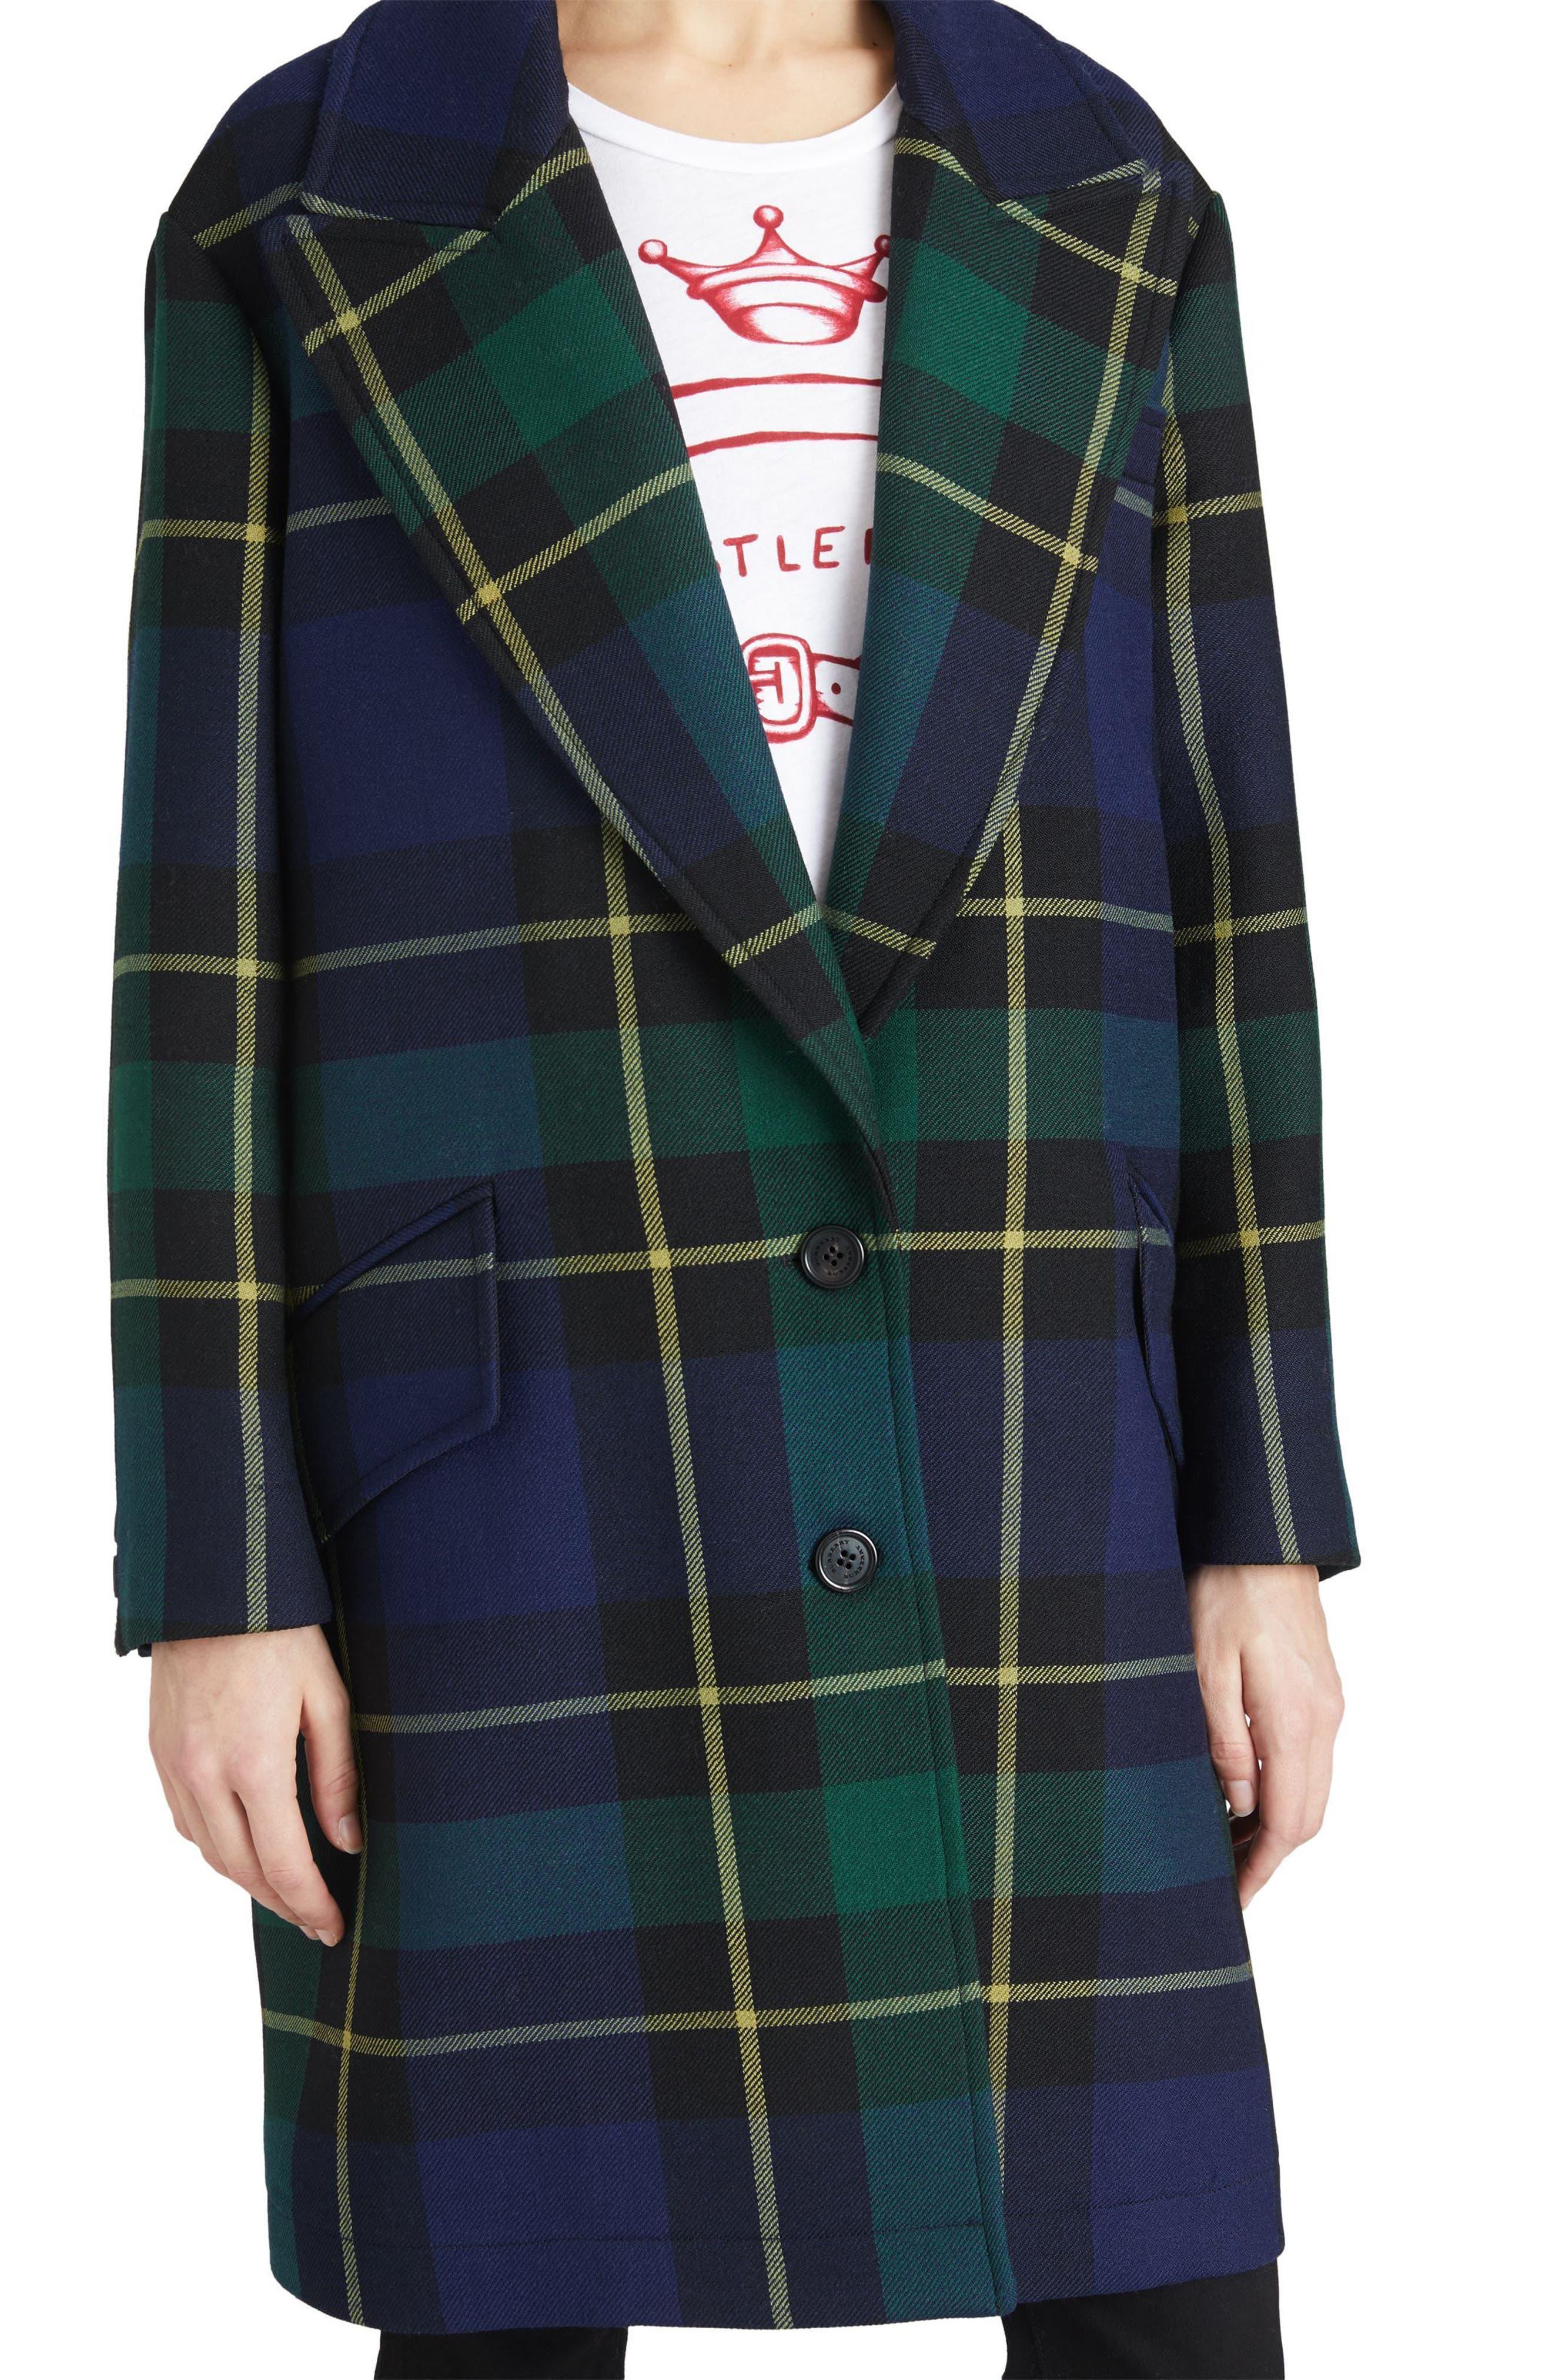 Strathyre Tartan Plaid Wool Blend Coat,                             Alternate thumbnail 4, color,                             303